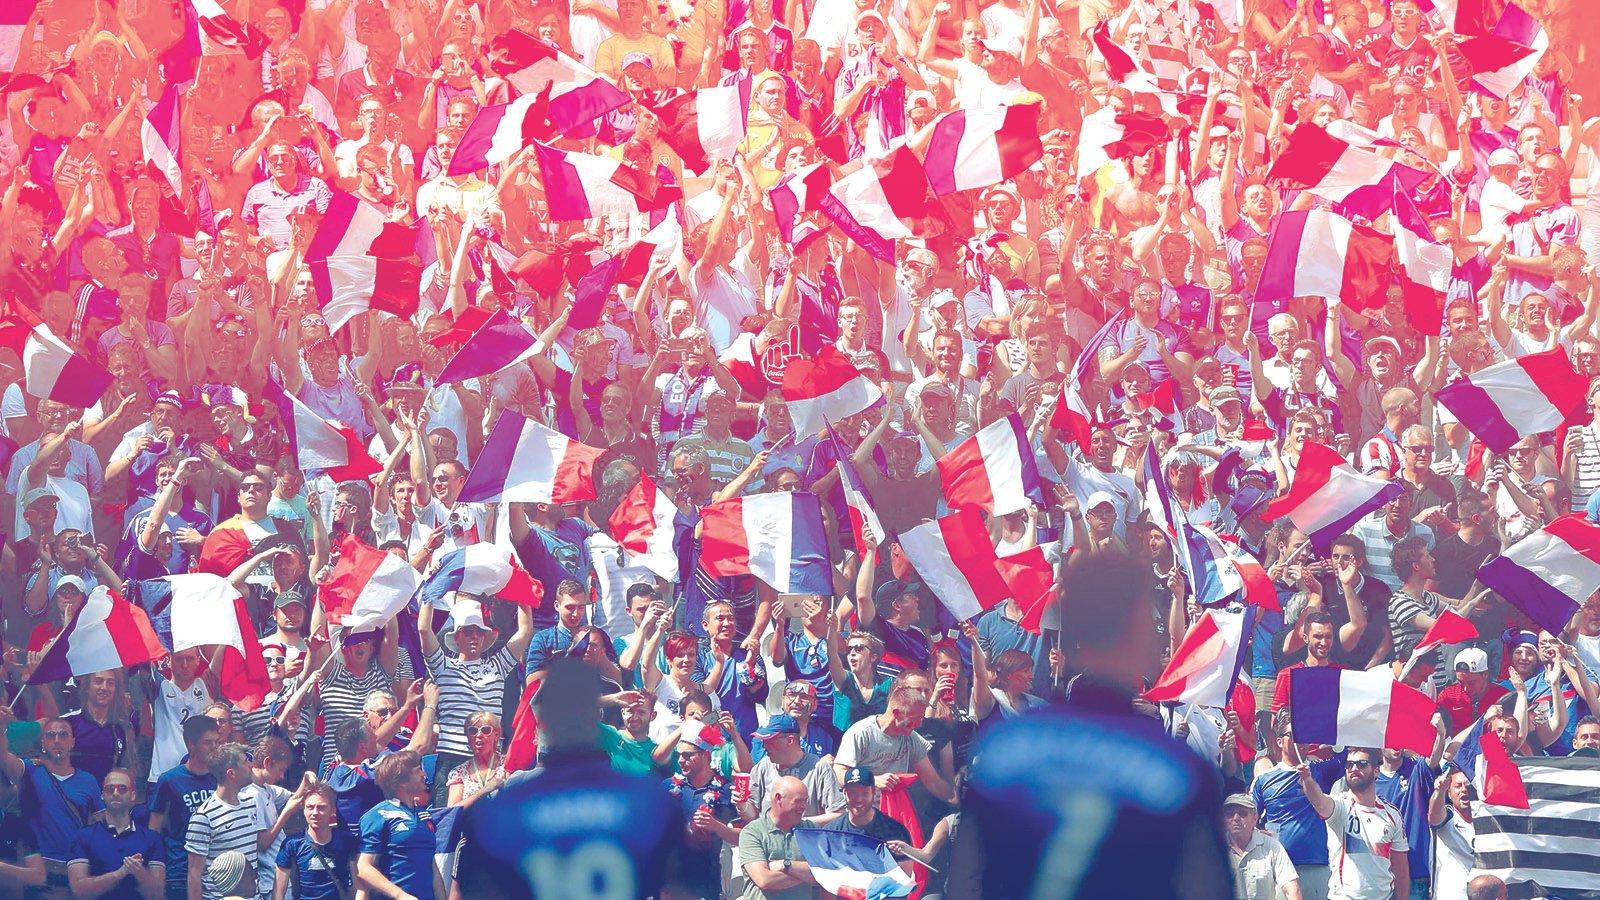 Kitvendr to enter French market